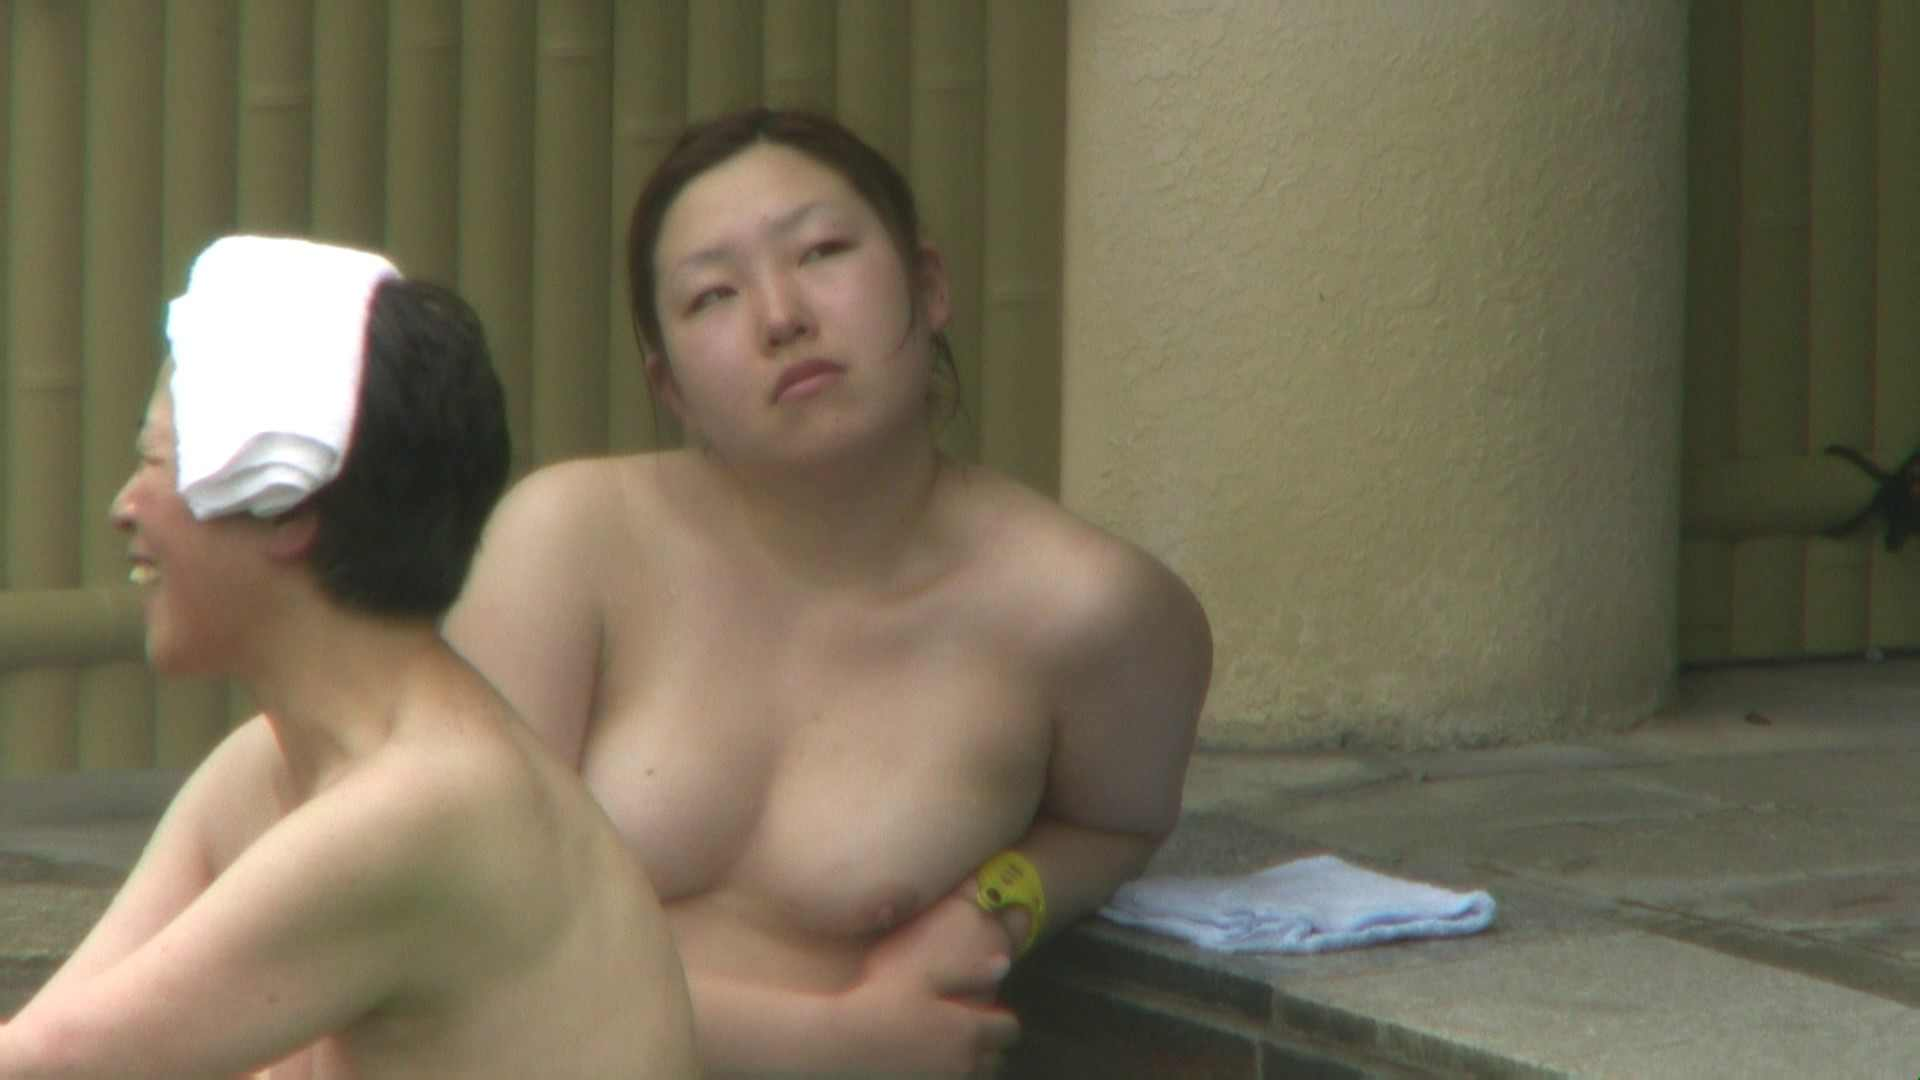 Aquaな露天風呂Vol.72【VIP限定】 露天風呂編 | 盗撮シリーズ  98PIX 37